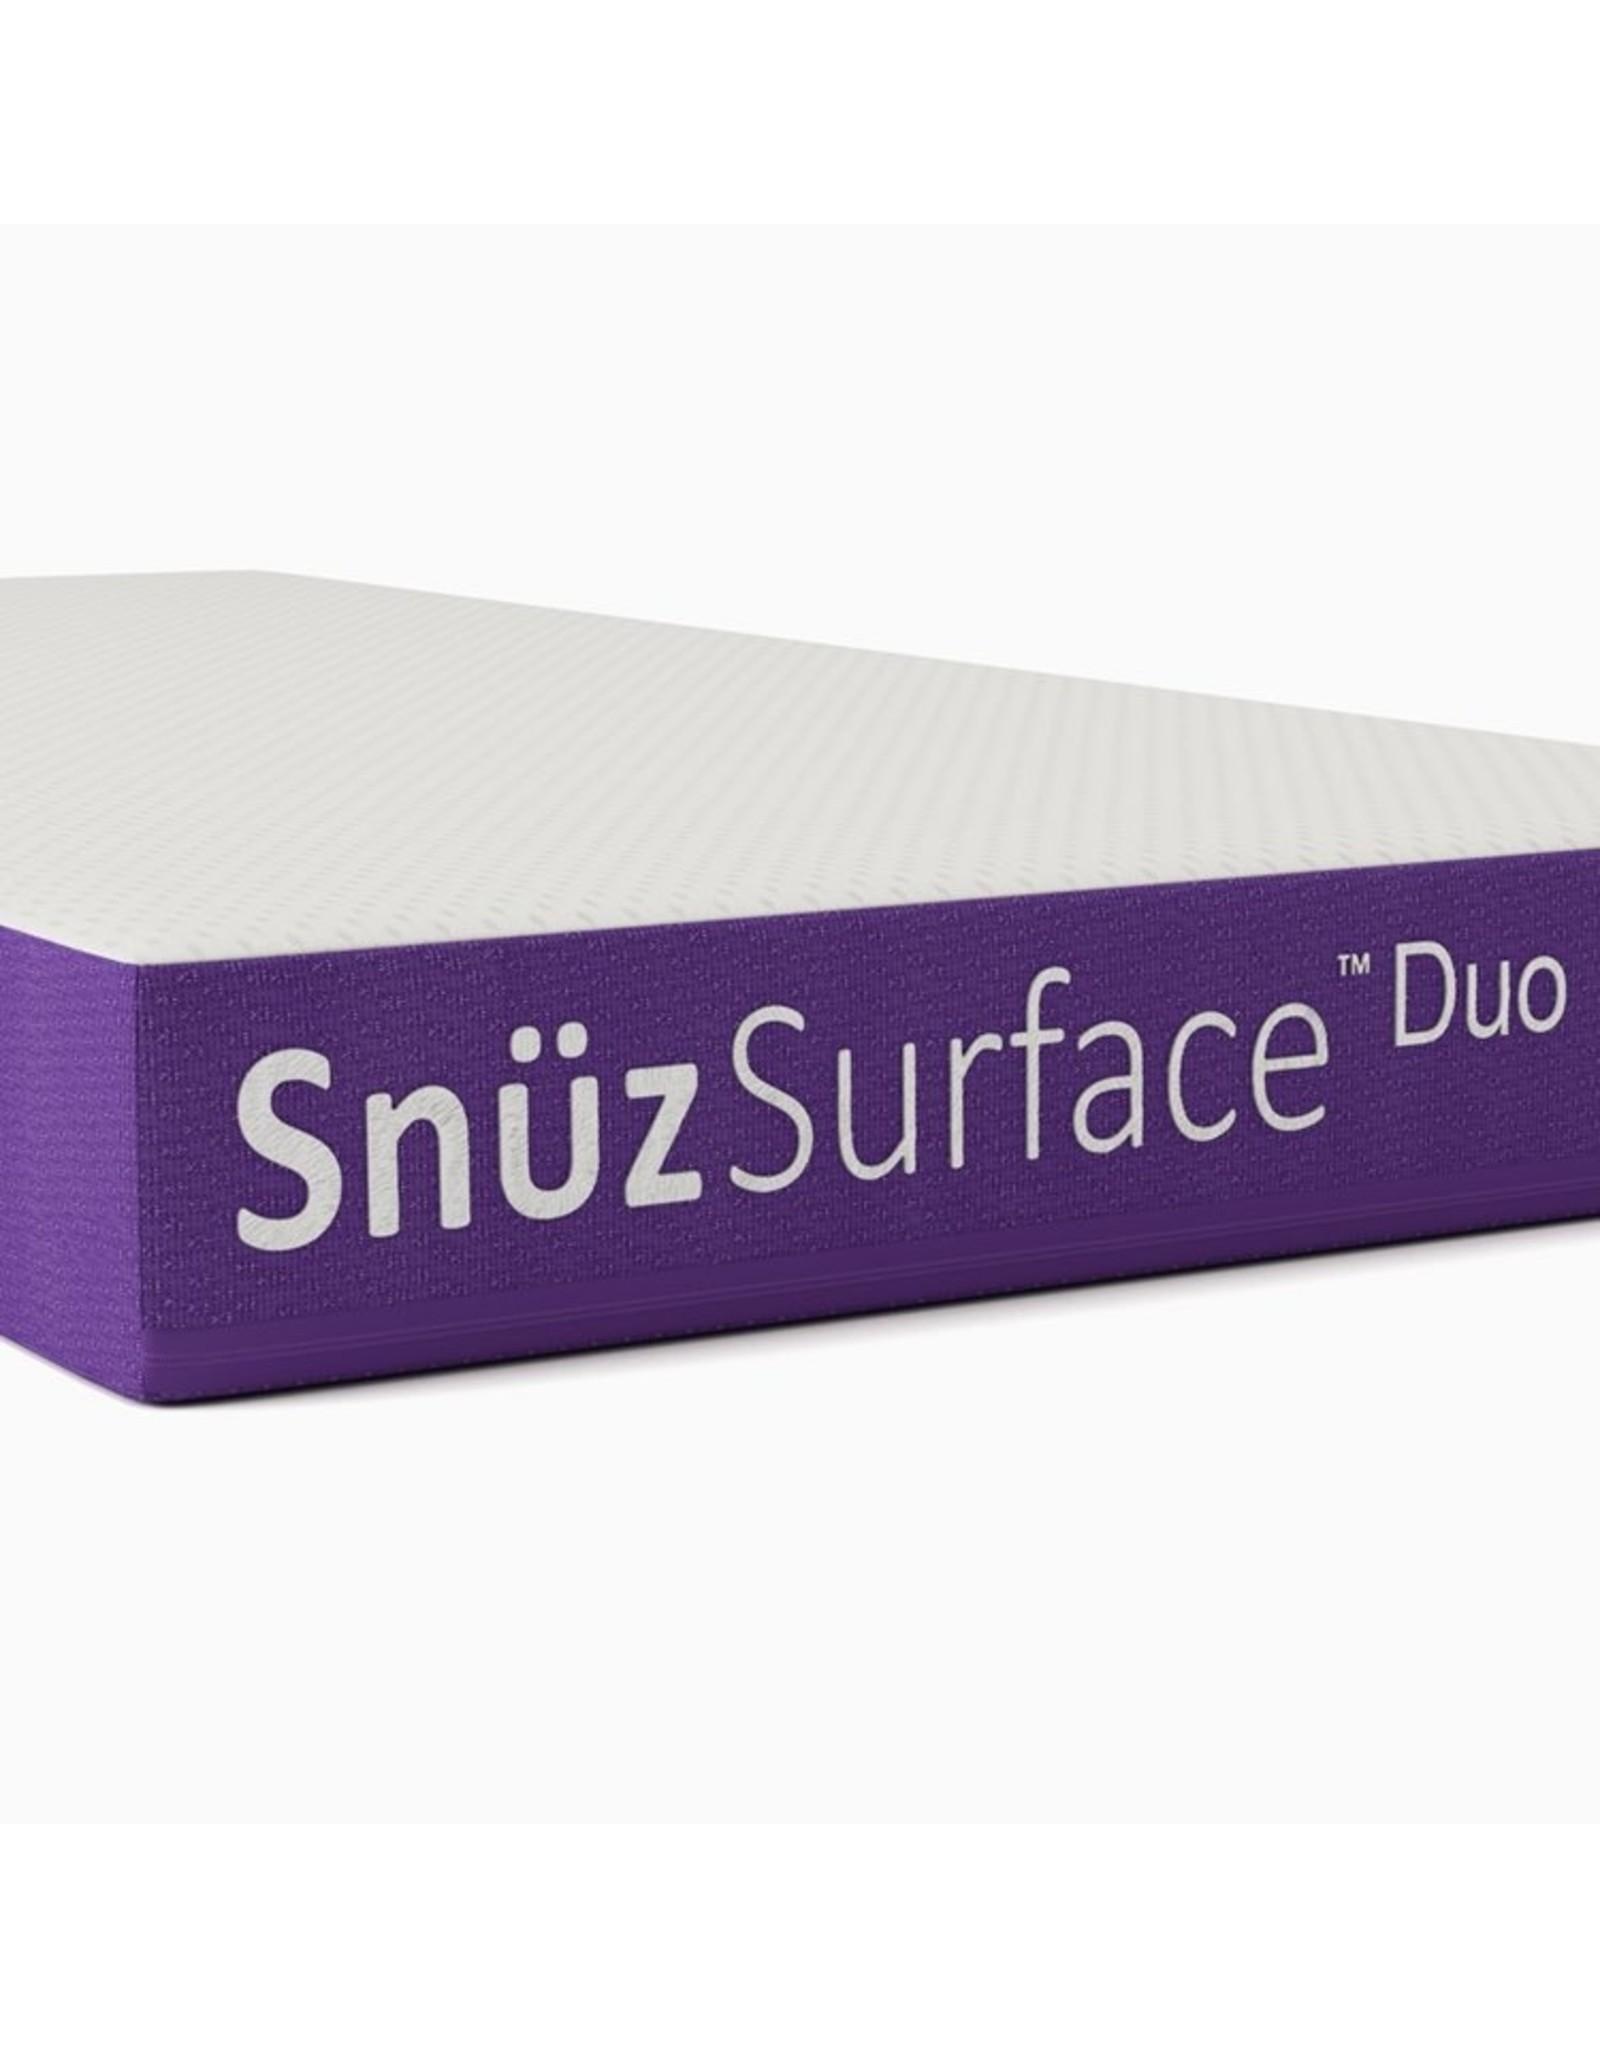 Snuz Snuzsurface Duo Dual Sided Cotbed Mattress SnuzKot